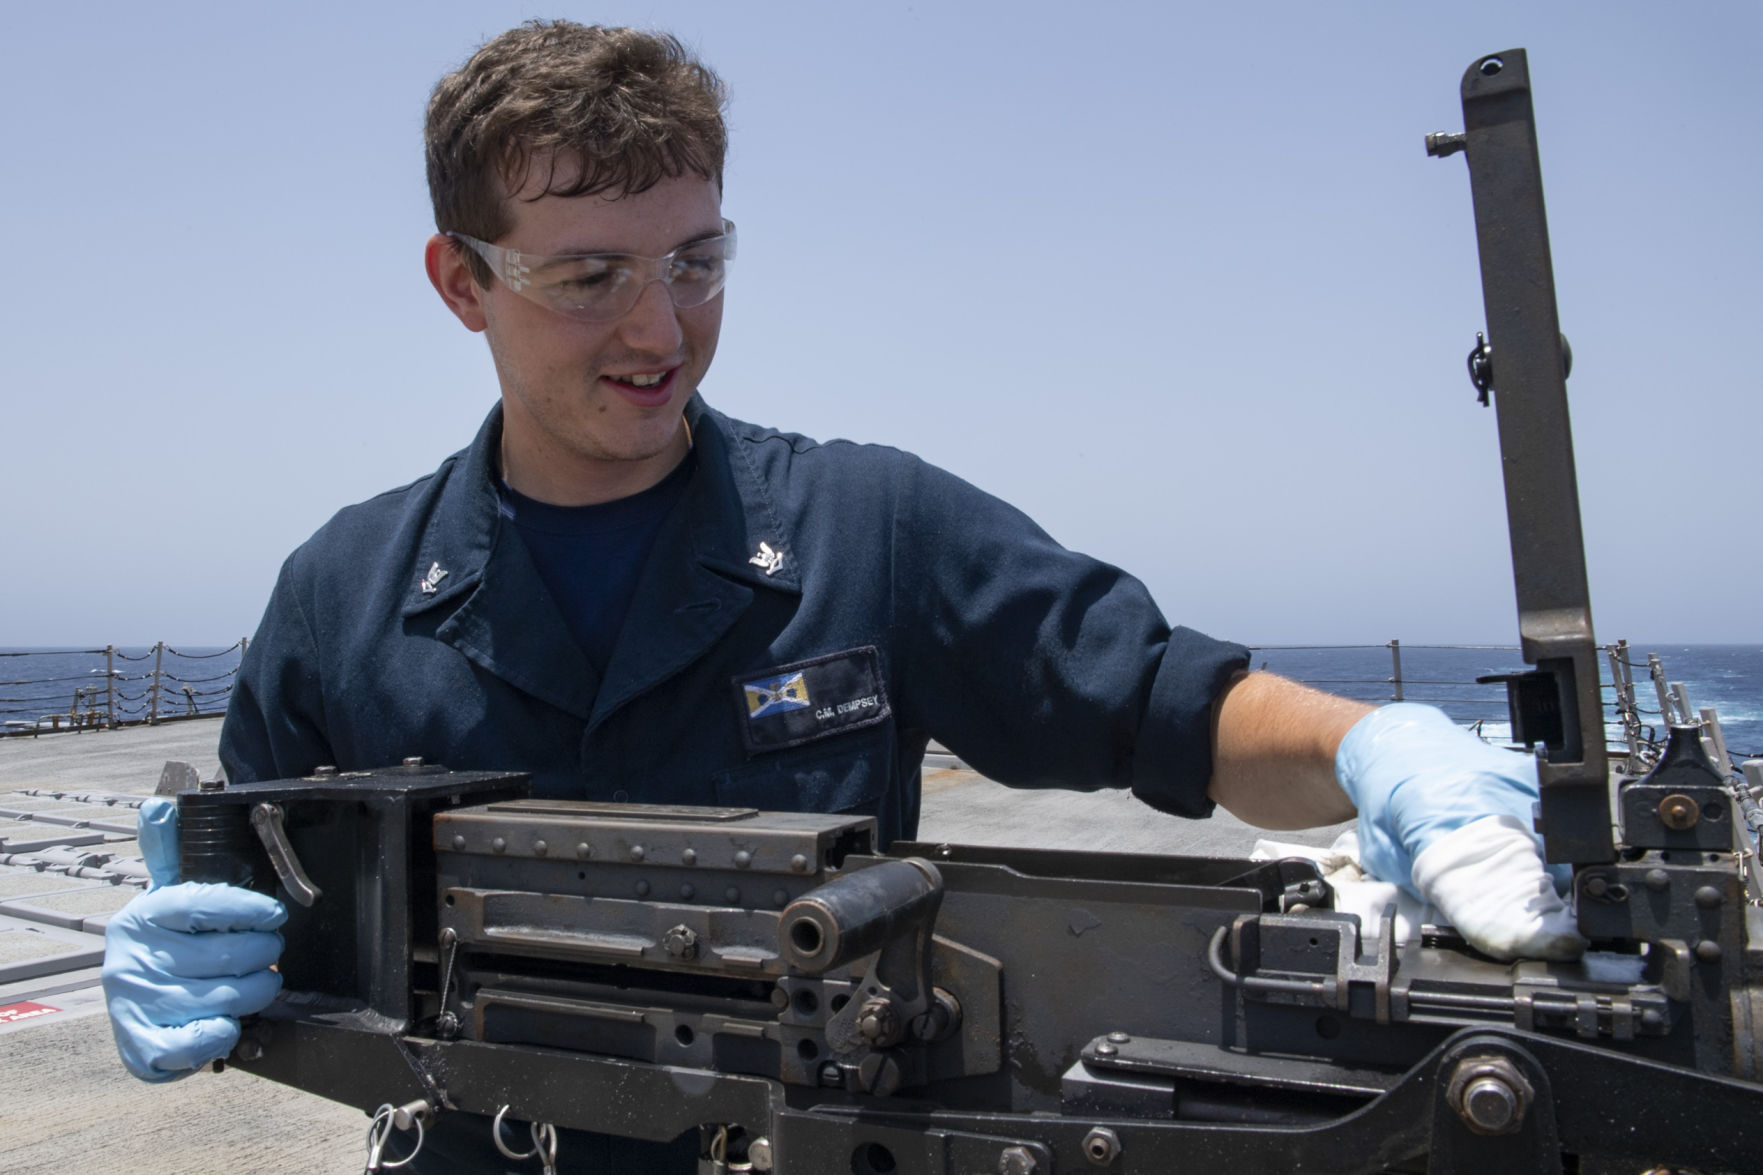 Dempsey serves aboard USS Mason